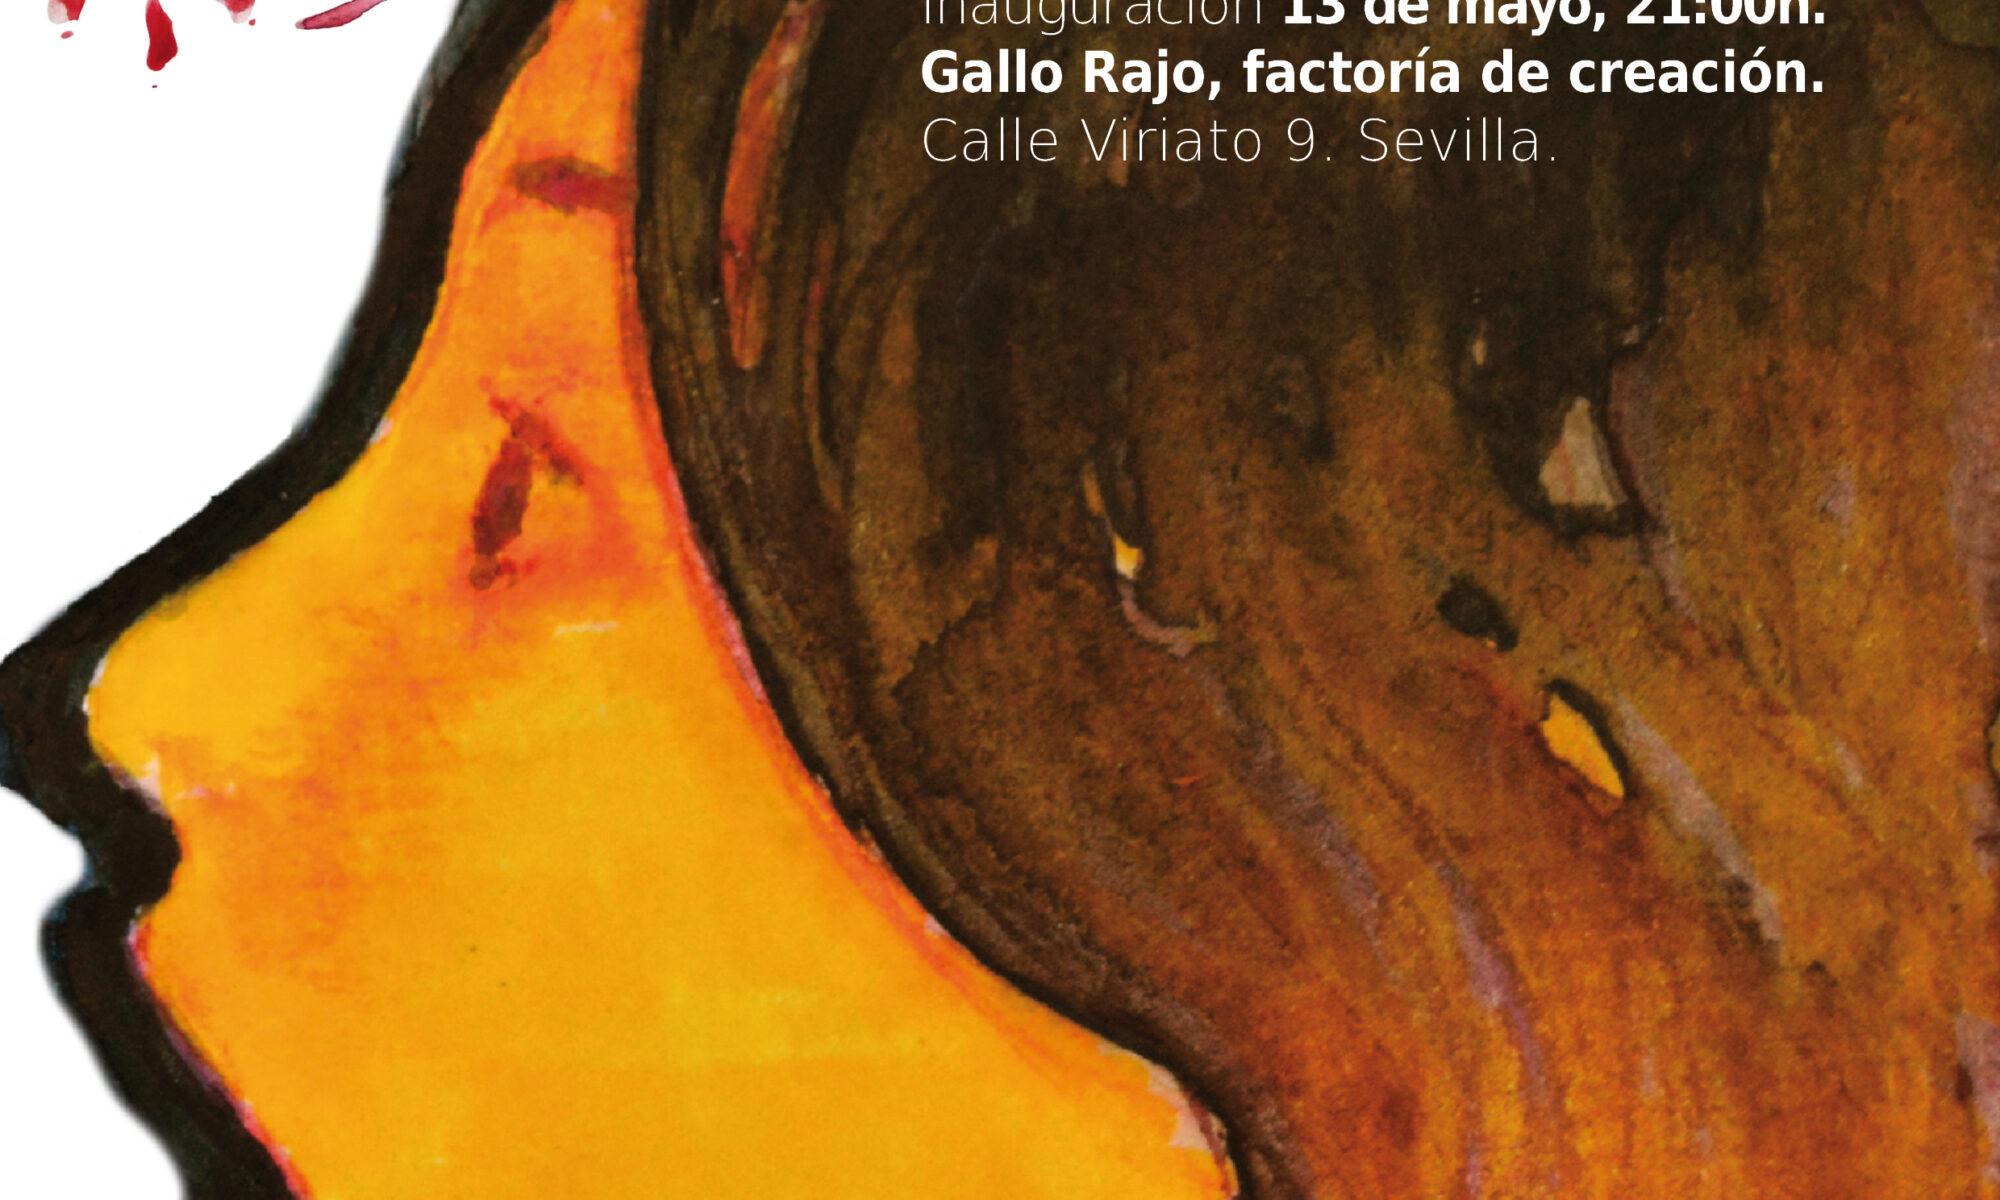 never gone forever, arte y realidad aumentada. Juanma Moreno Sánchez 2016